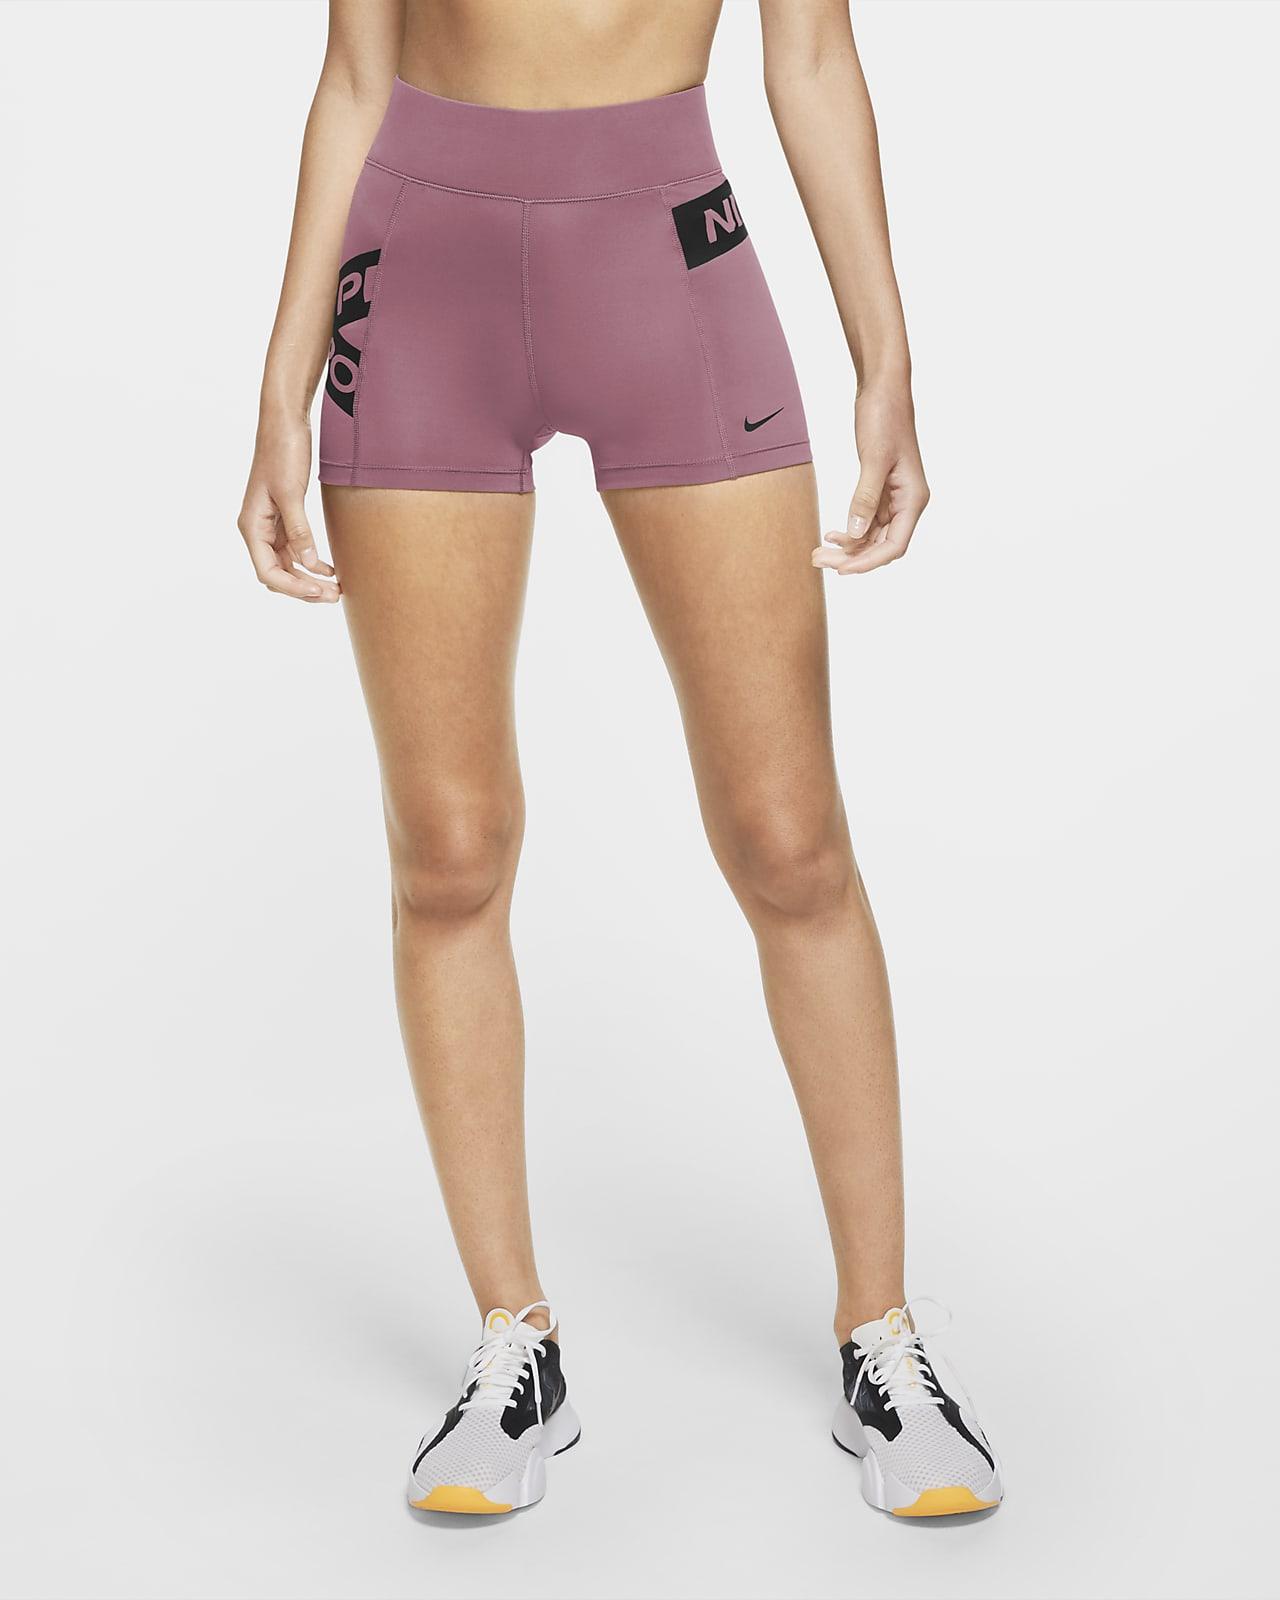 Nike Pro Women's Graphic Shorts